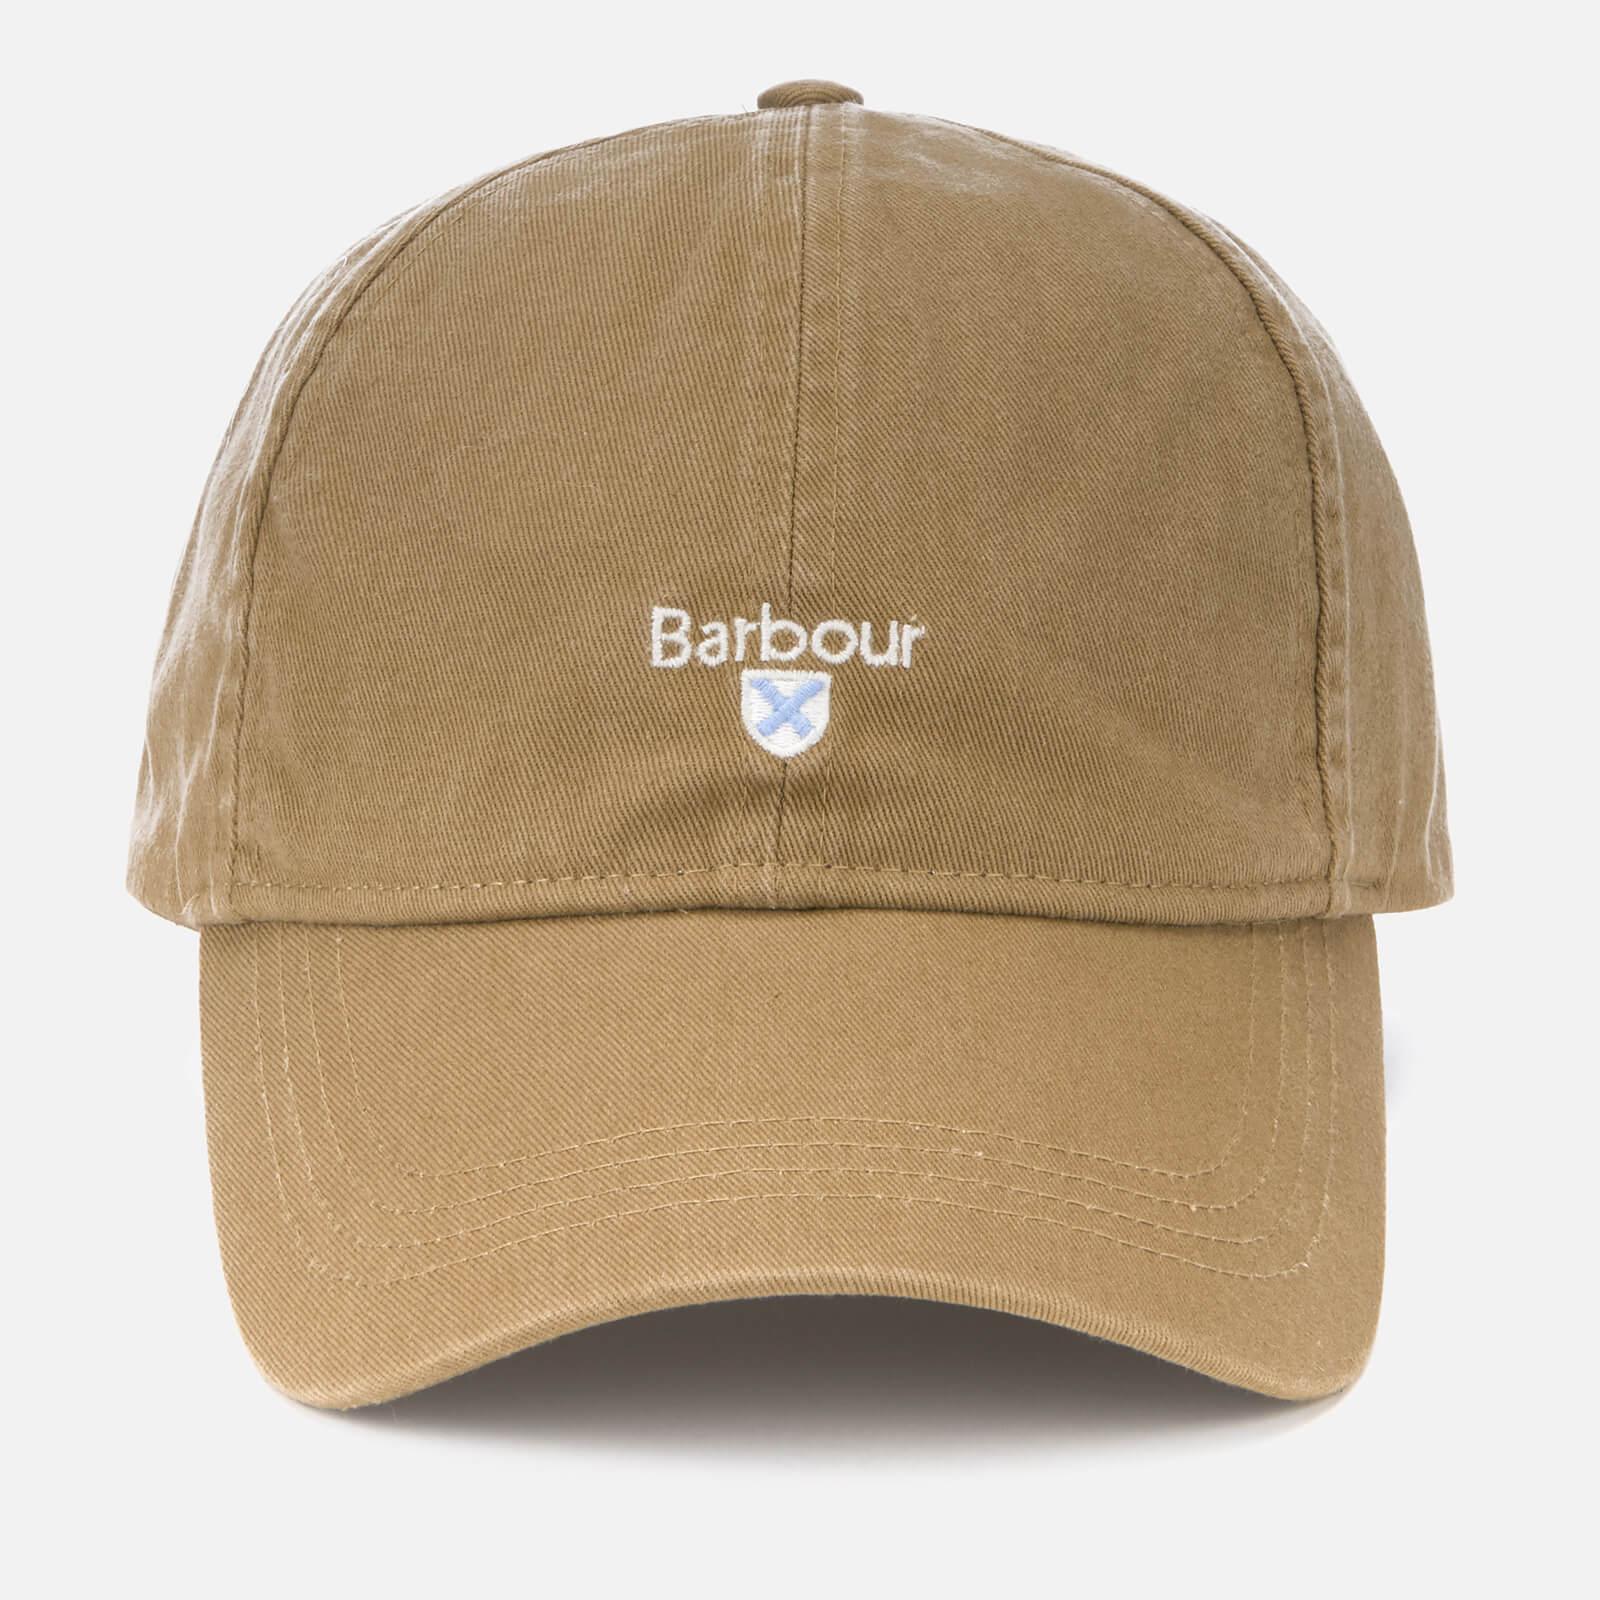 ecdb0b633c672 Barbour Men's Cascade Sports Cap - Dark Stone